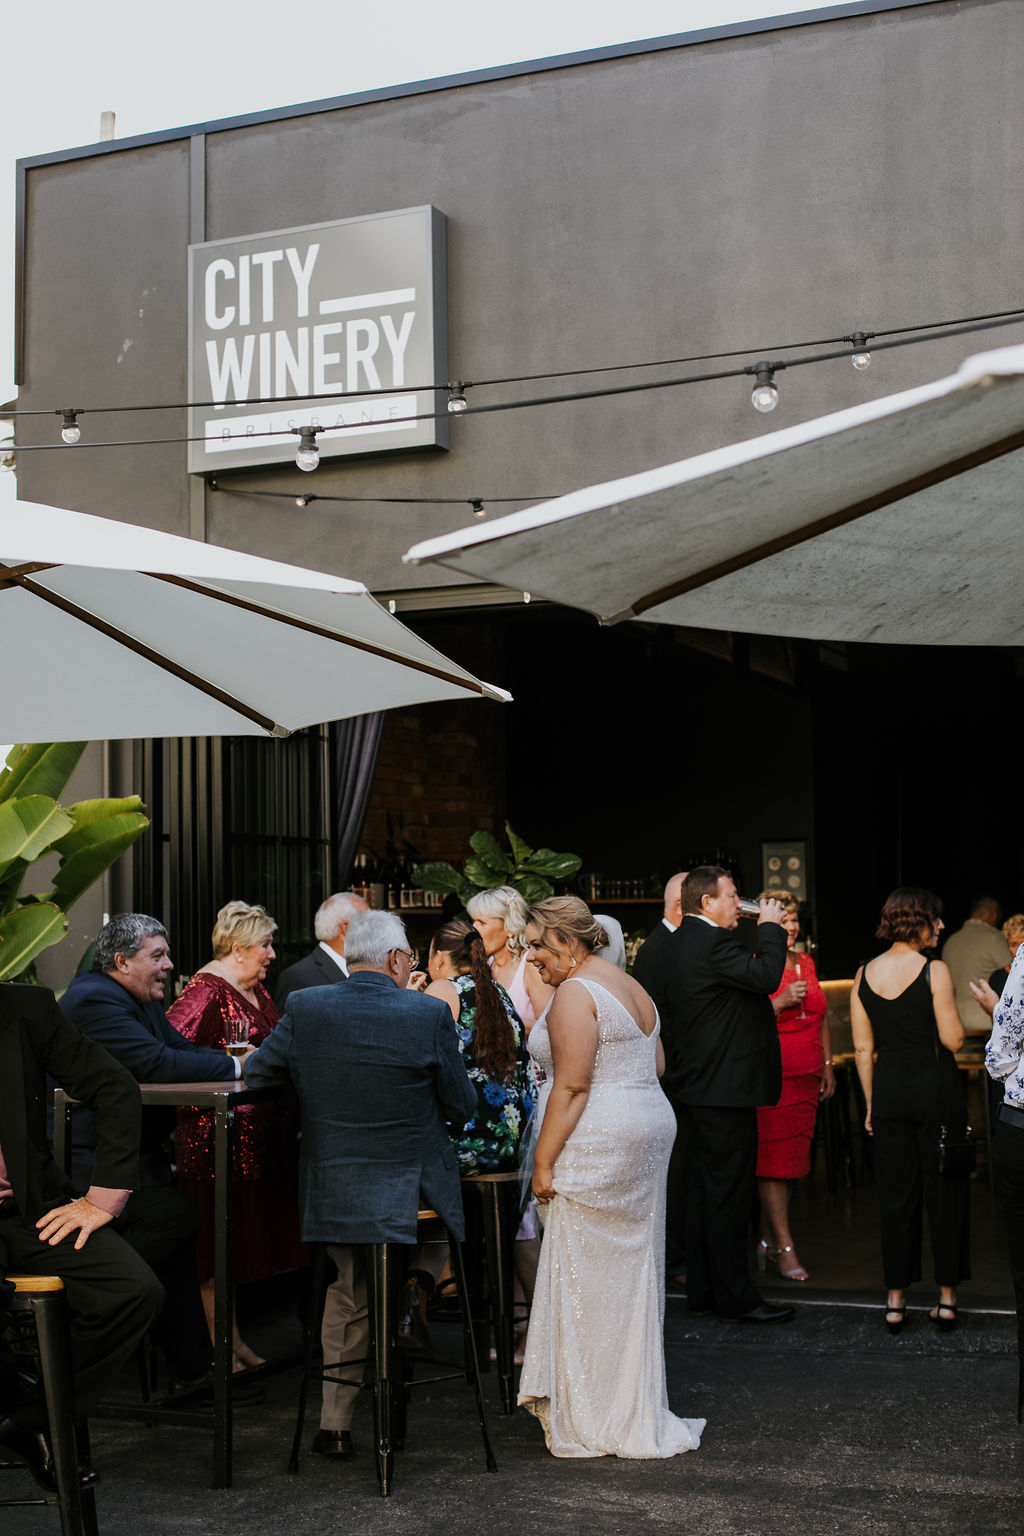 City Winery wedding Brisbane